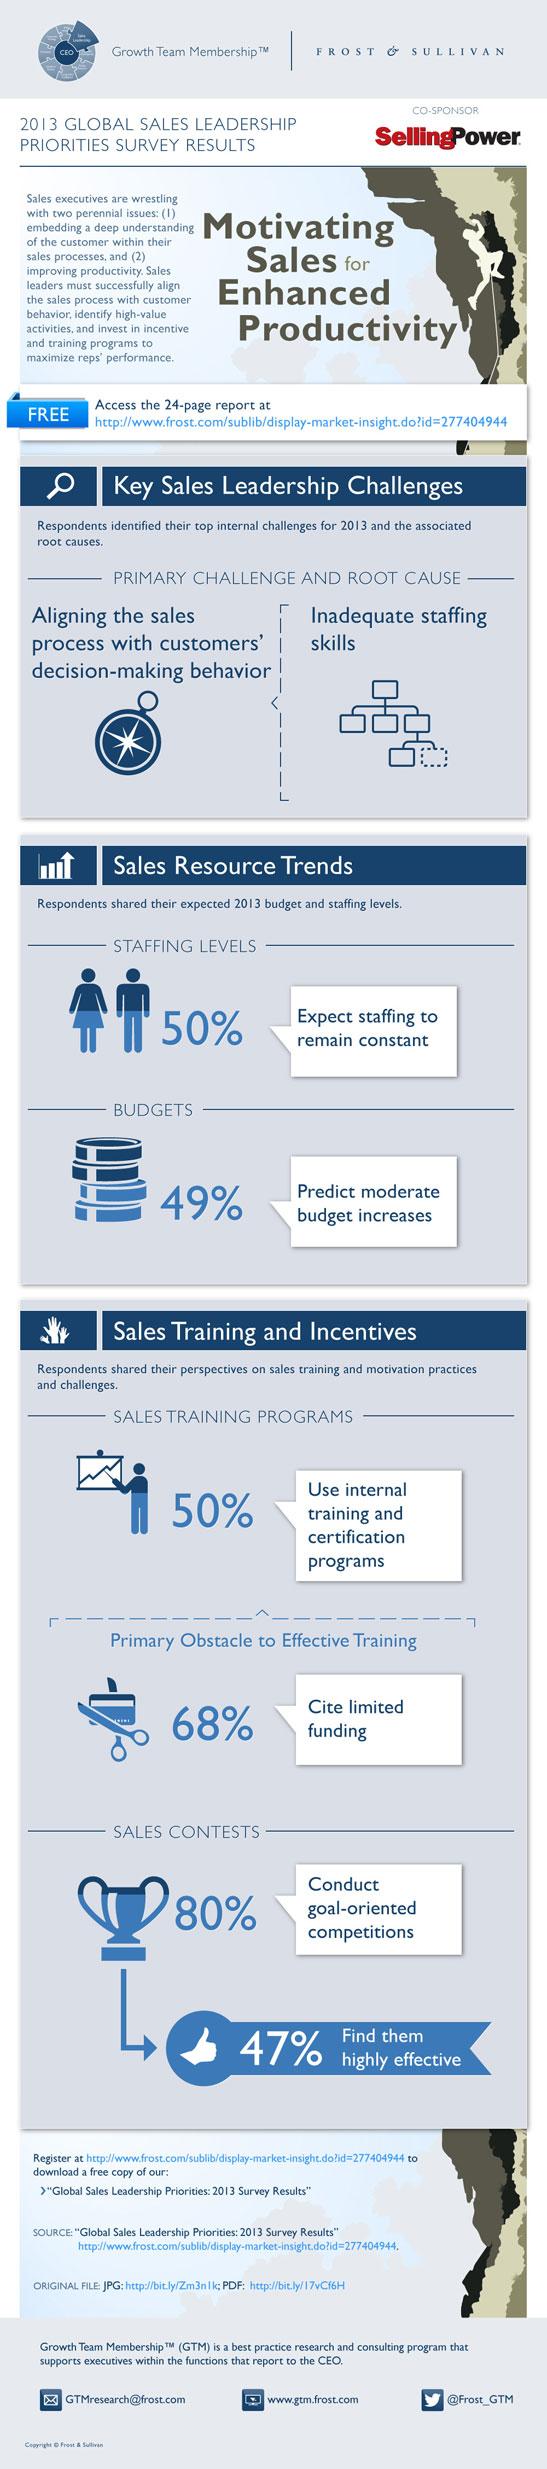 sales productivity infographic